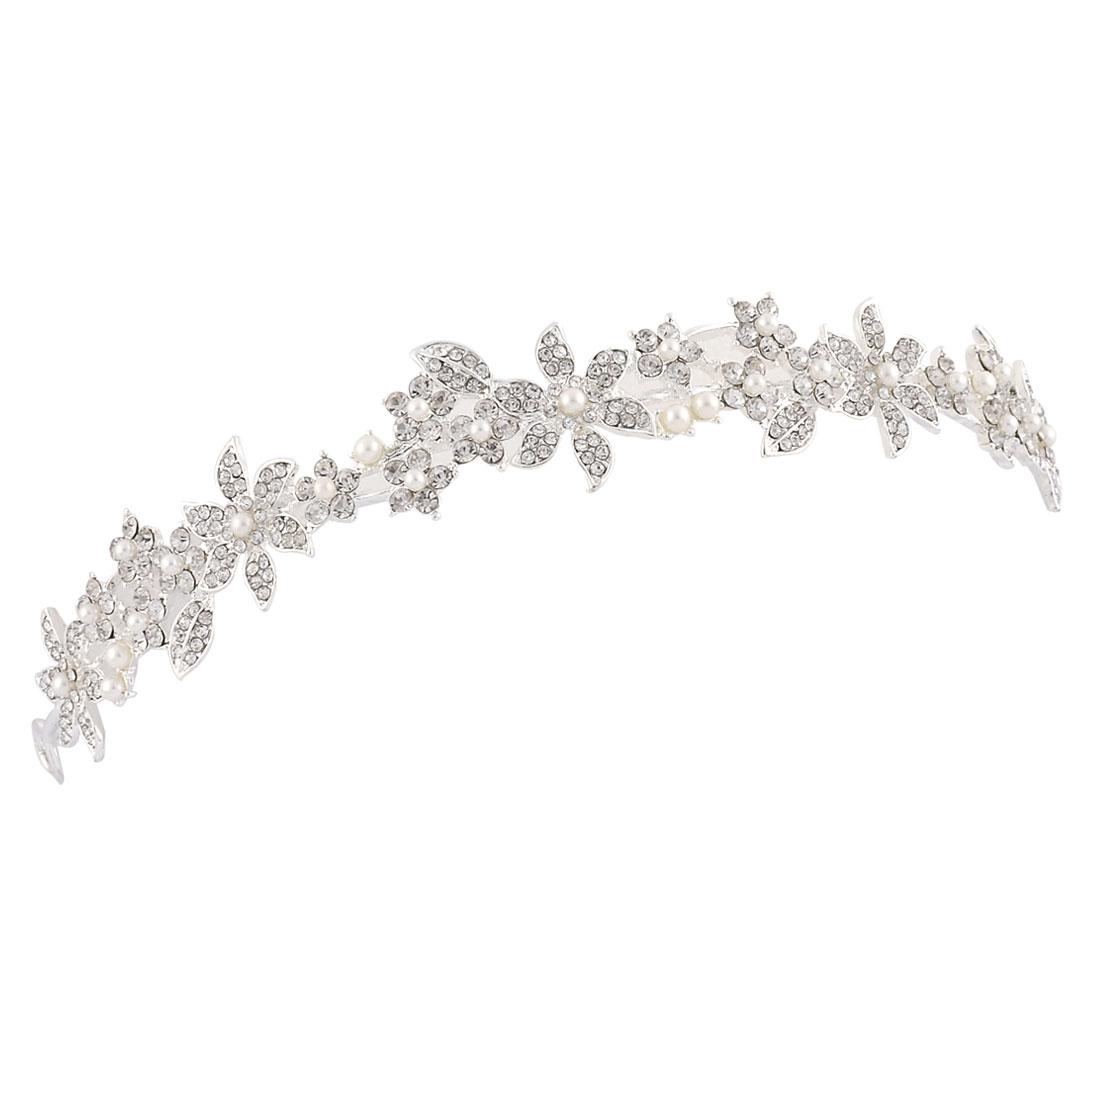 Wedding Bride Lady Simulated Imitation Pearl Detail Rhinestone Inlaid Tiara Headpiece Headband